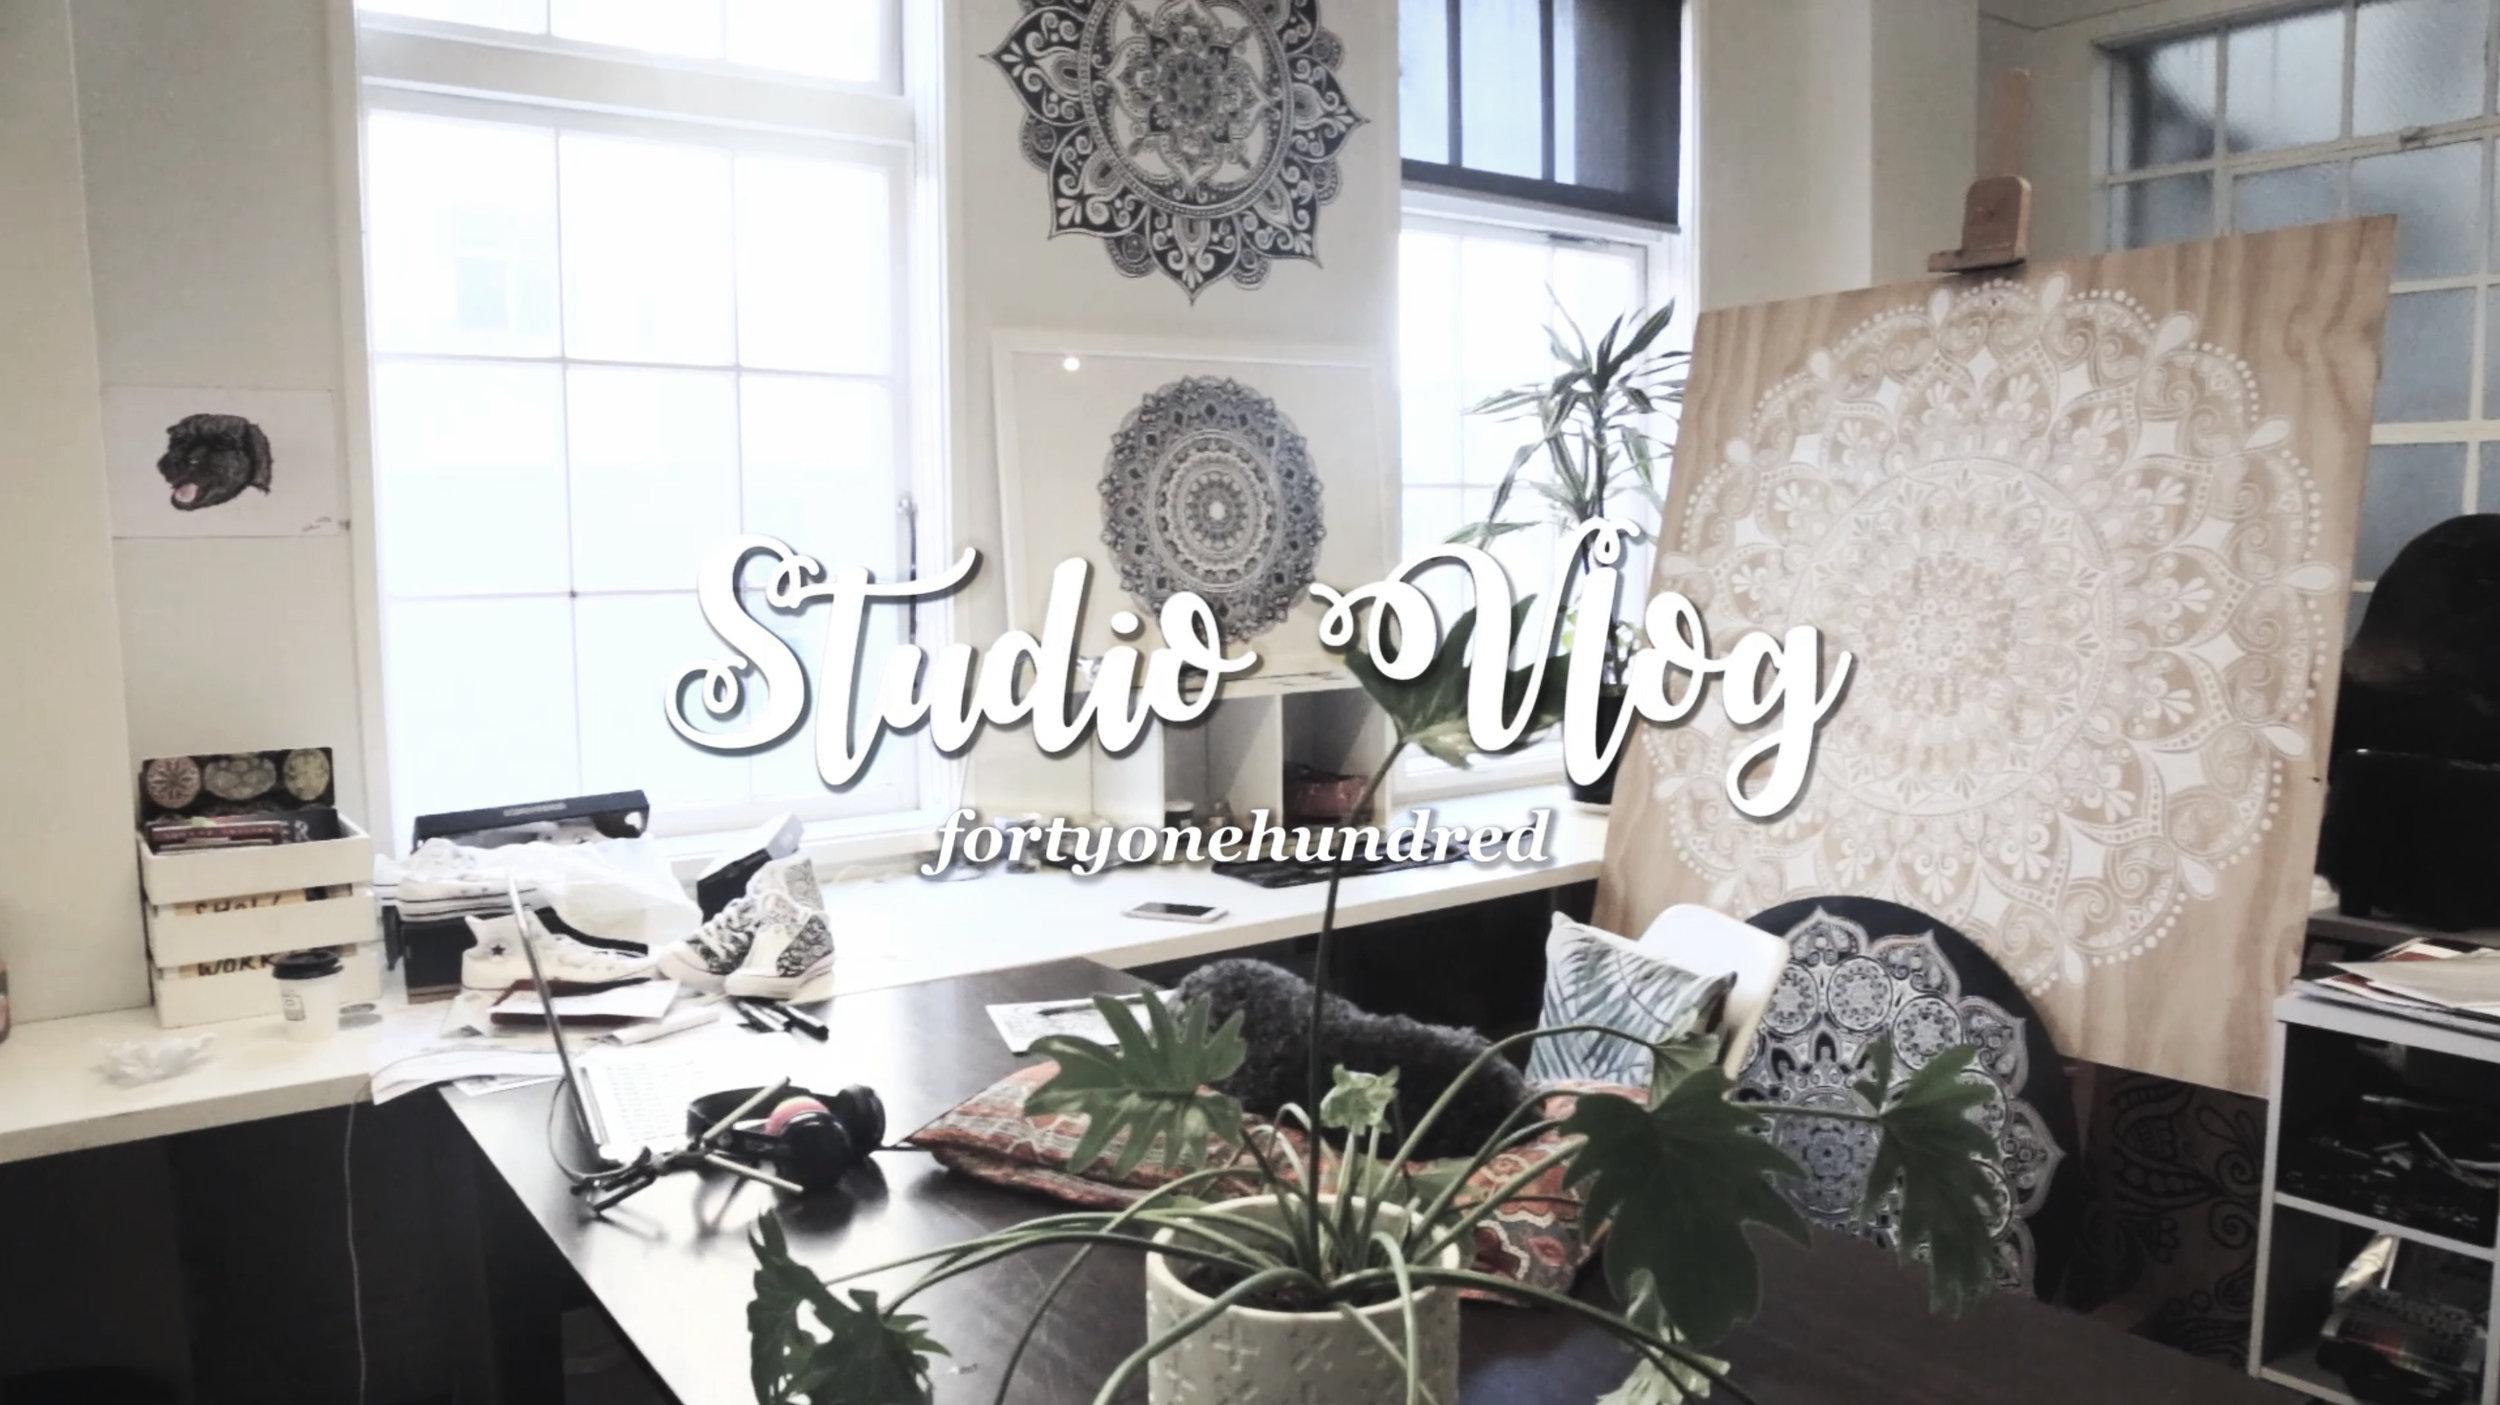 Studio blog - fortyonehundred